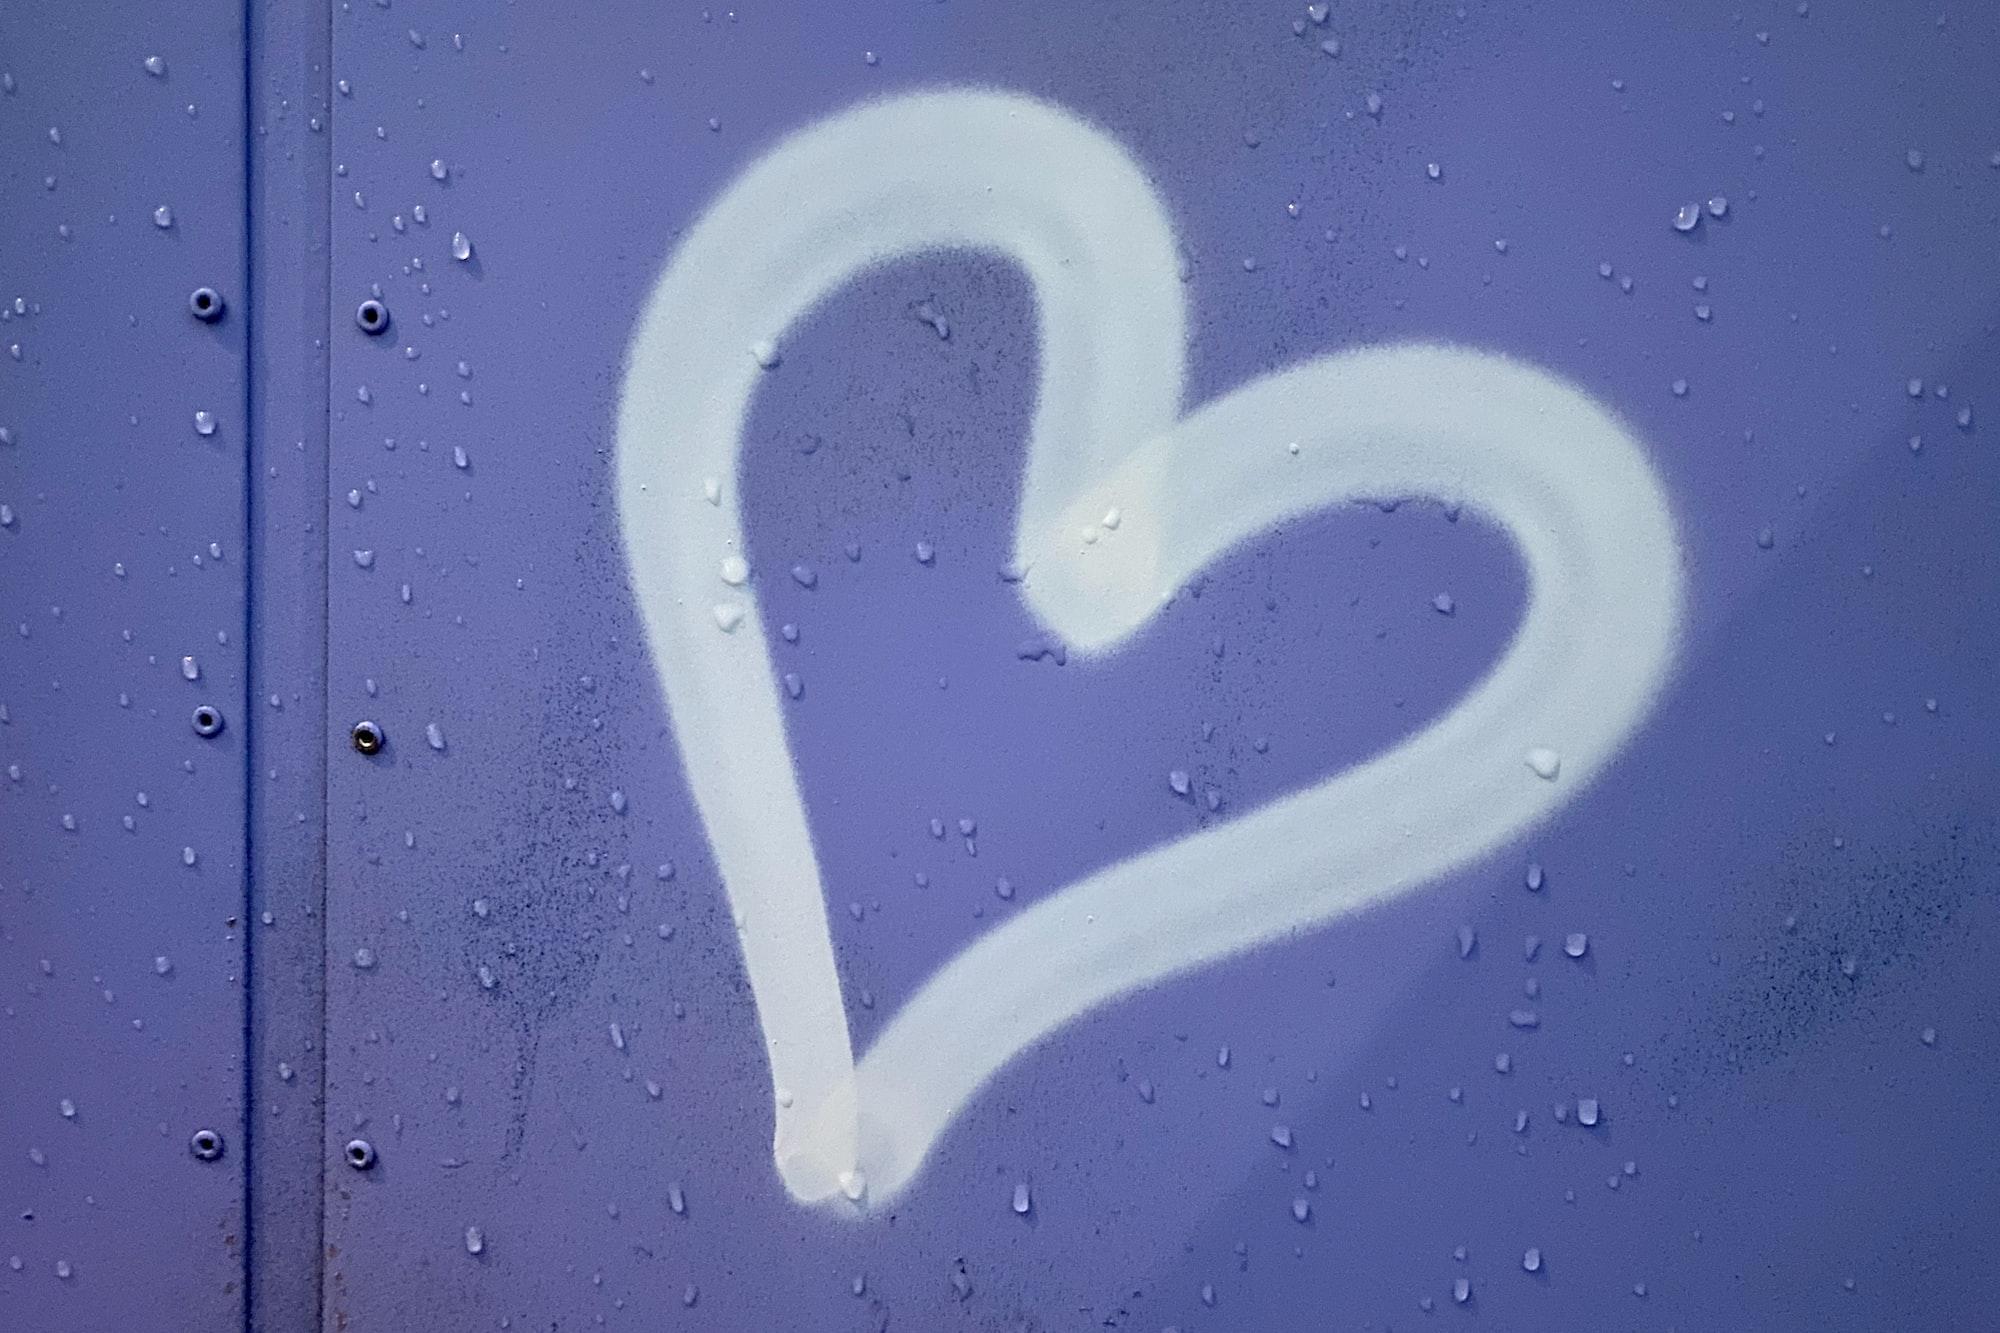 follow the white heart